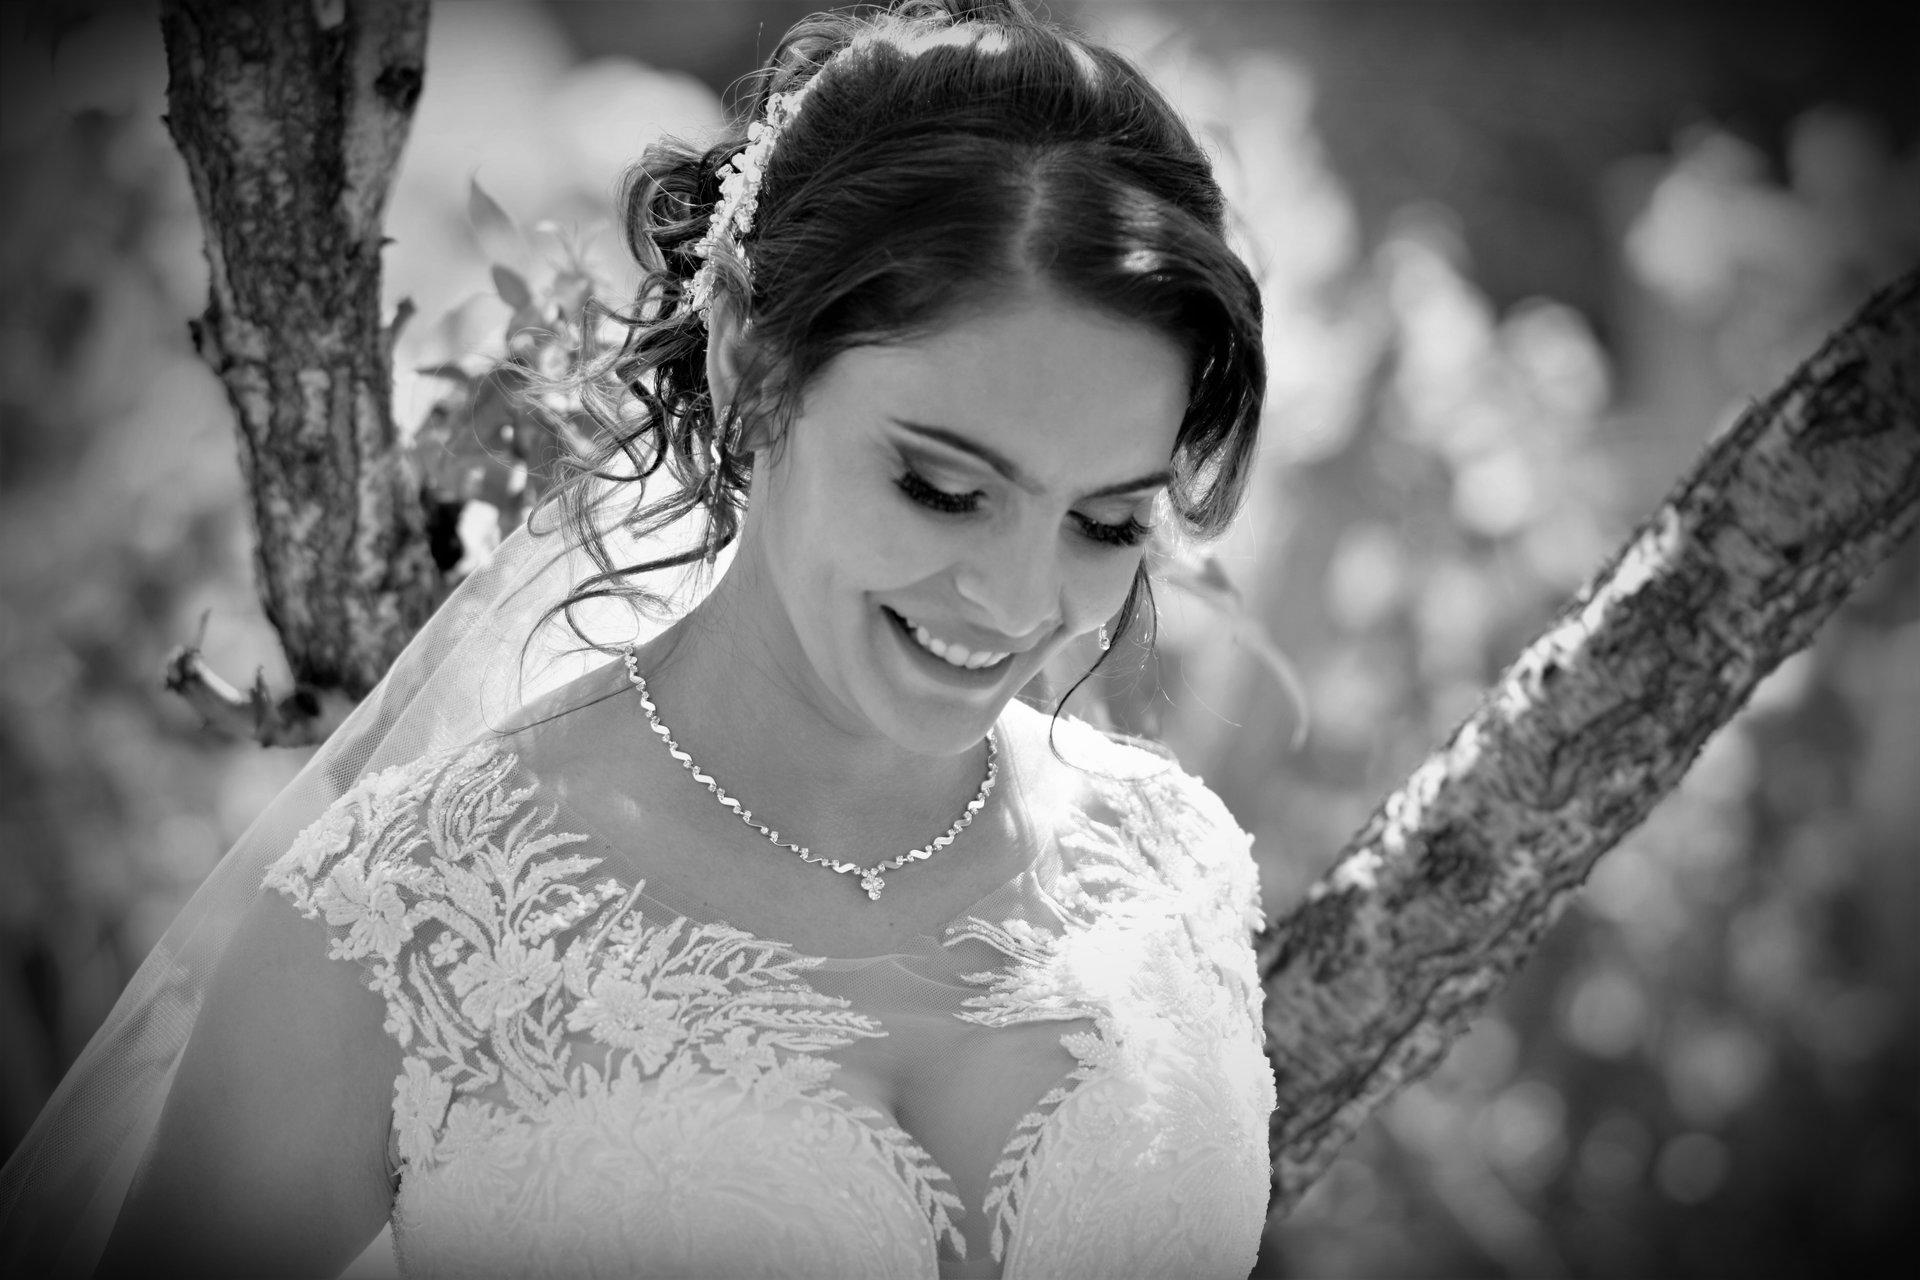 Photo in Wedding | Author Rumen Cekov - rumenvc | PHOTO FORUM